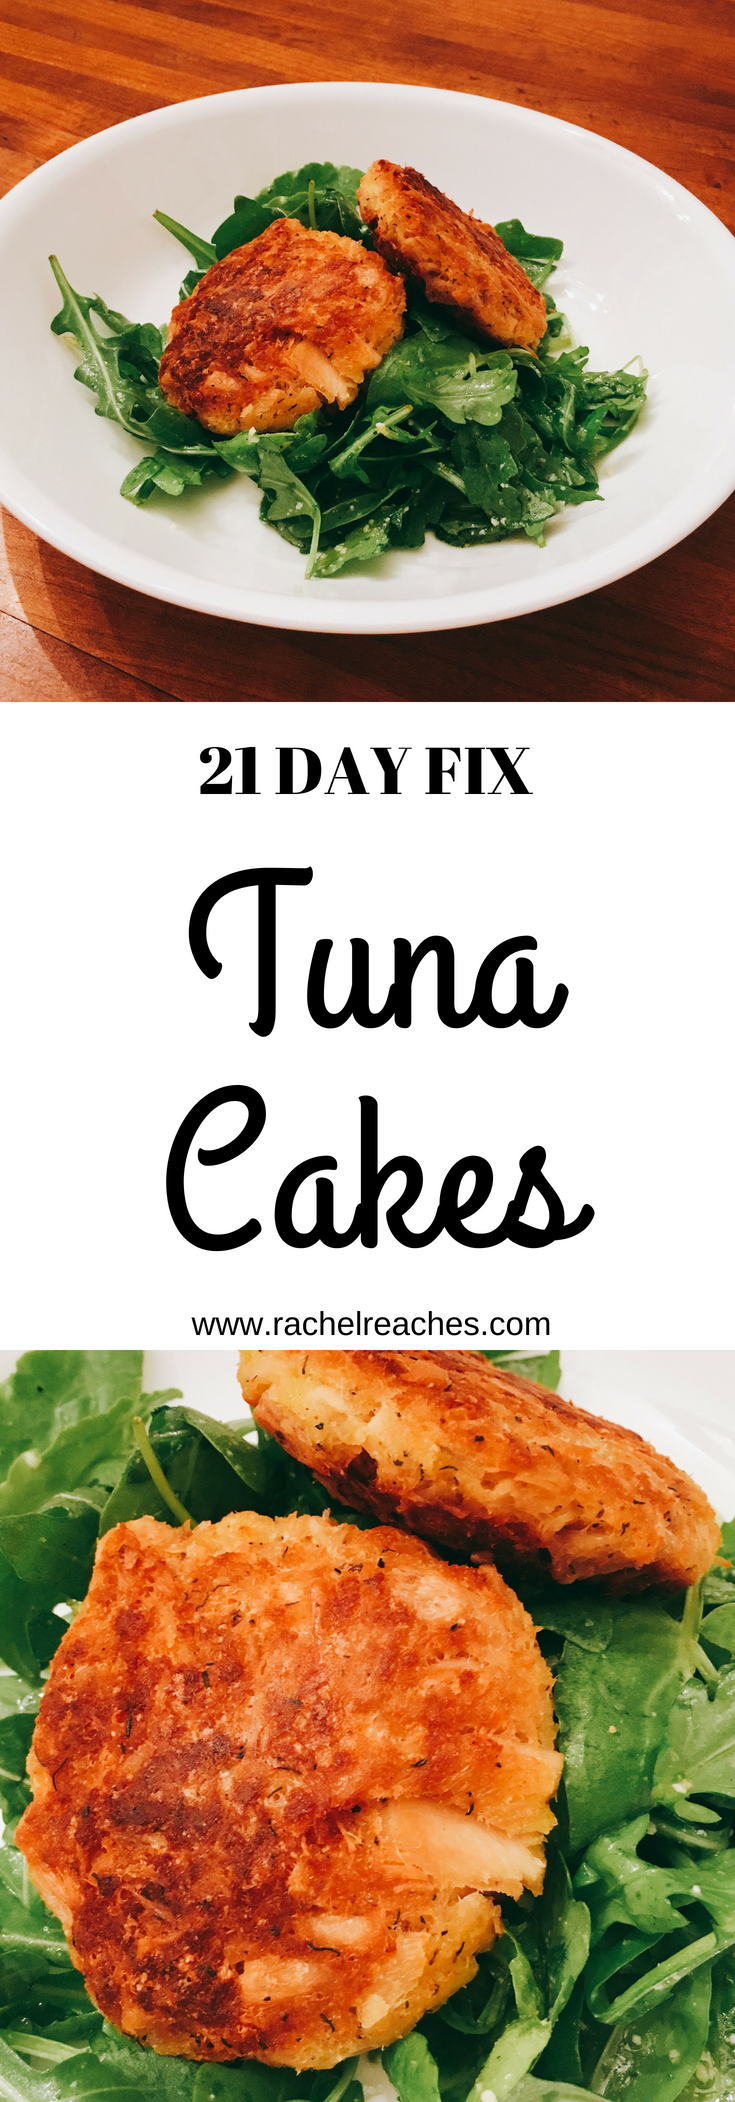 Tuna Cakes Pin - 21 Day Fix.png